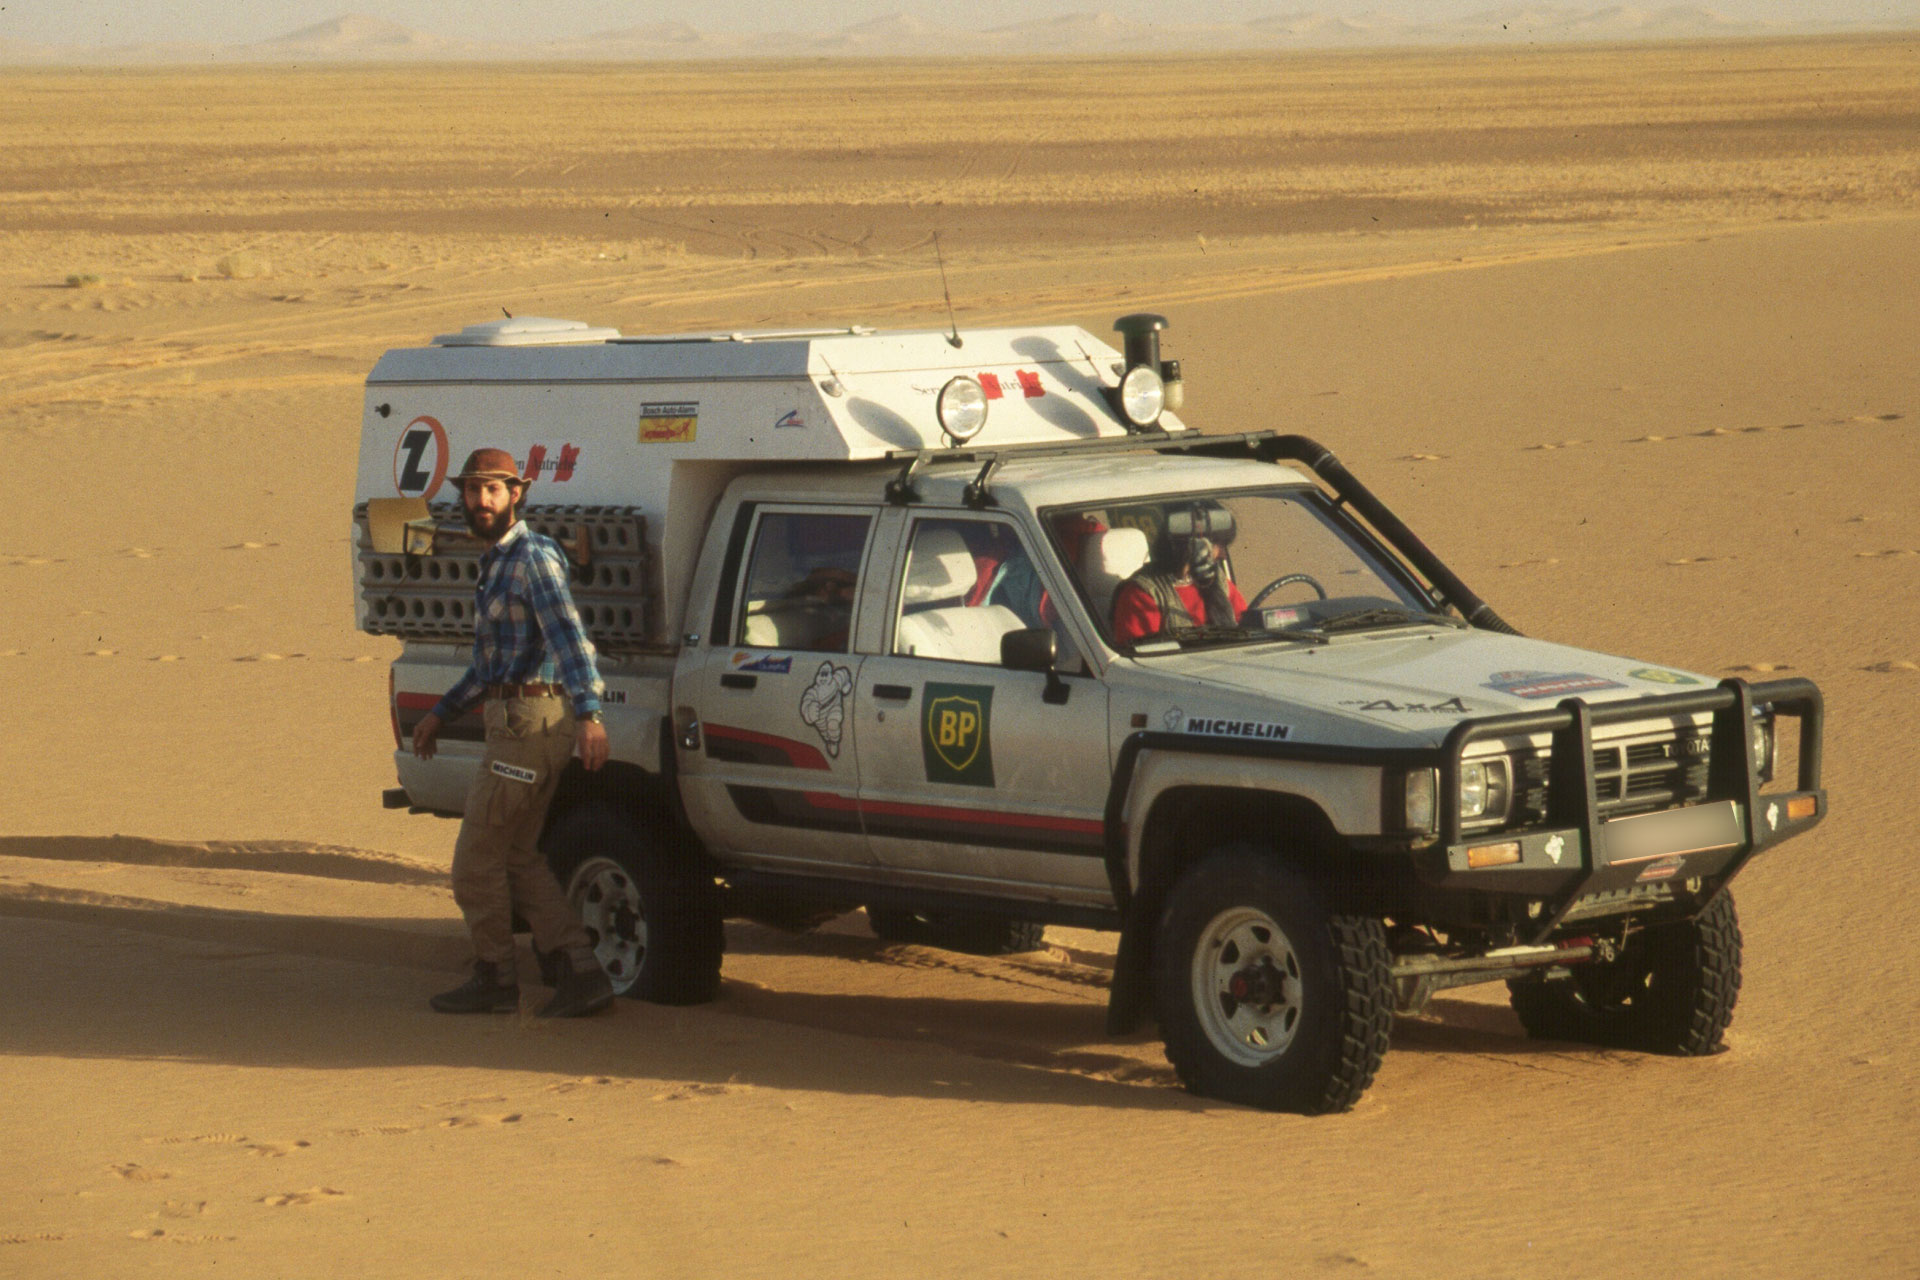 Abenteuerreise offroad Afrika